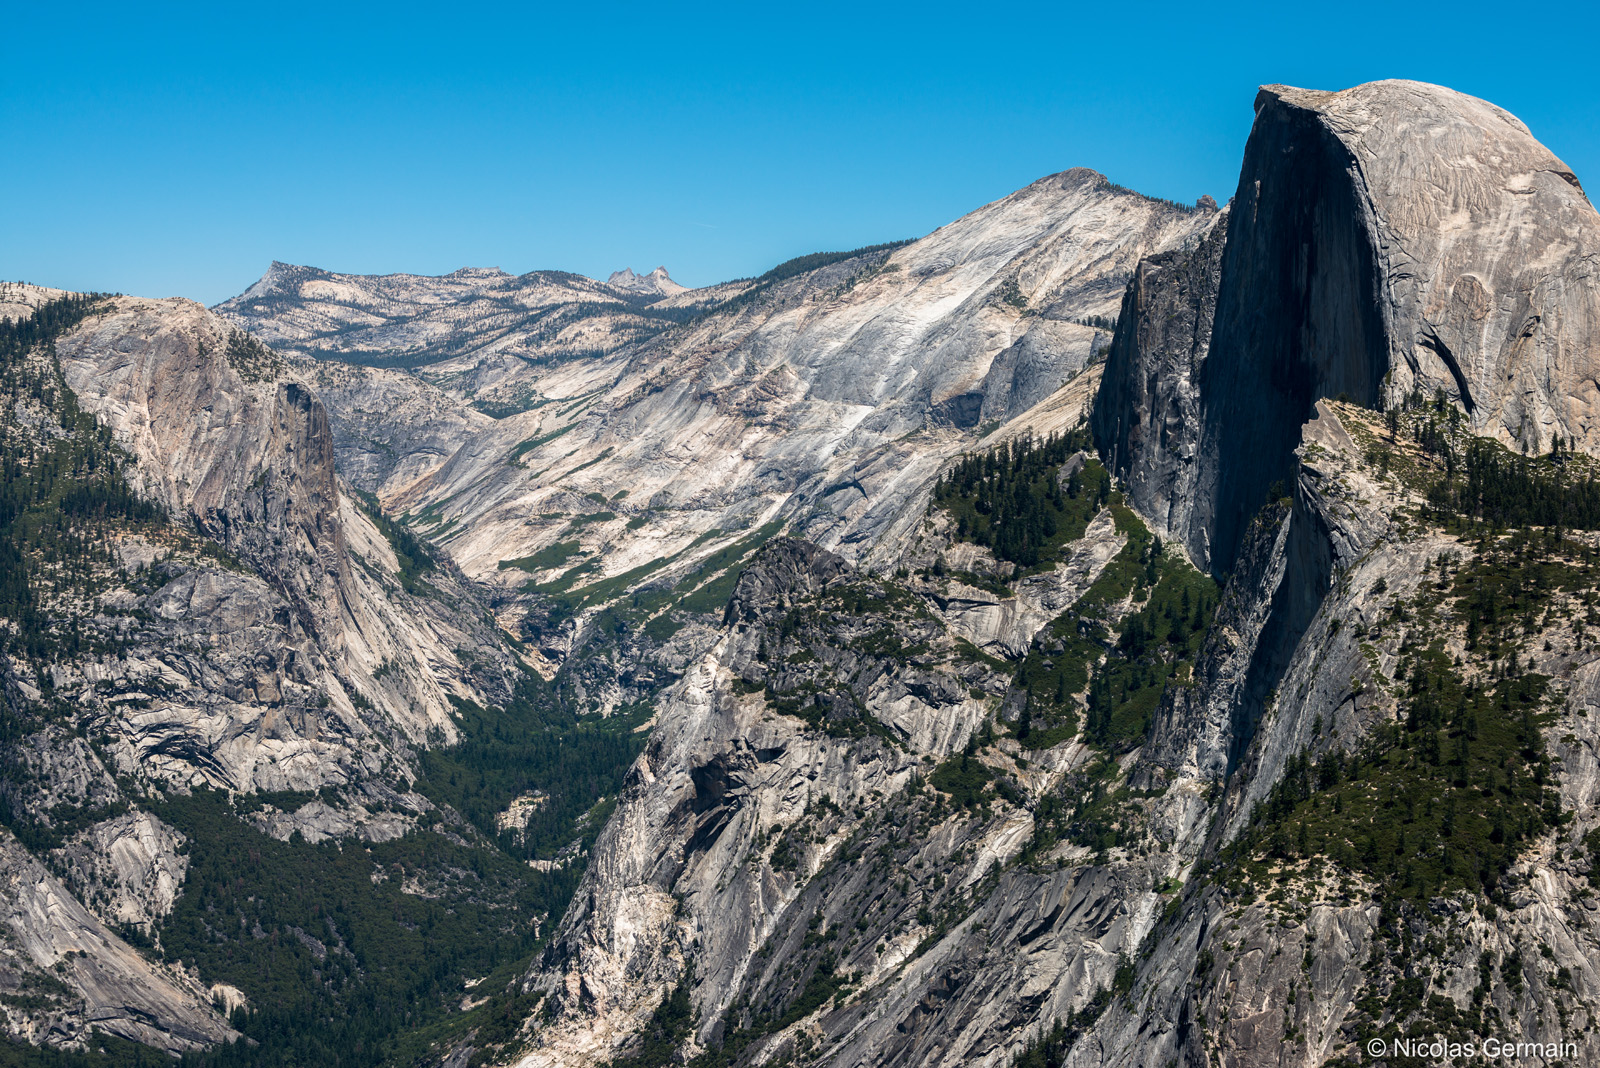 L'impressionnant Half Dome domine la vallée de Yosemite National Park, Californie